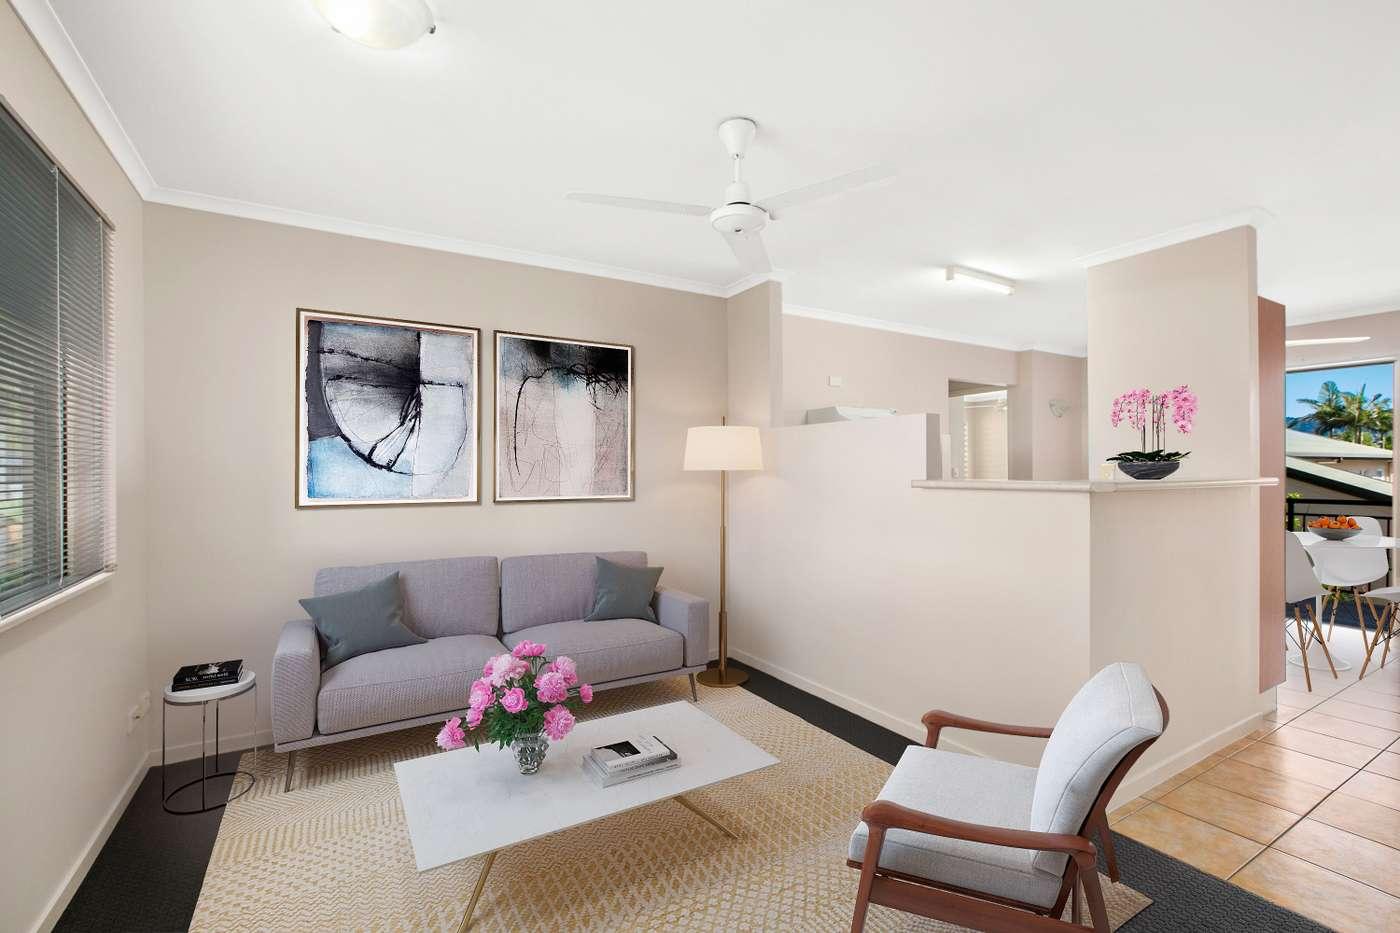 Main view of Homely unit listing, 308/53 McCormack Street, Manunda, QLD 4870